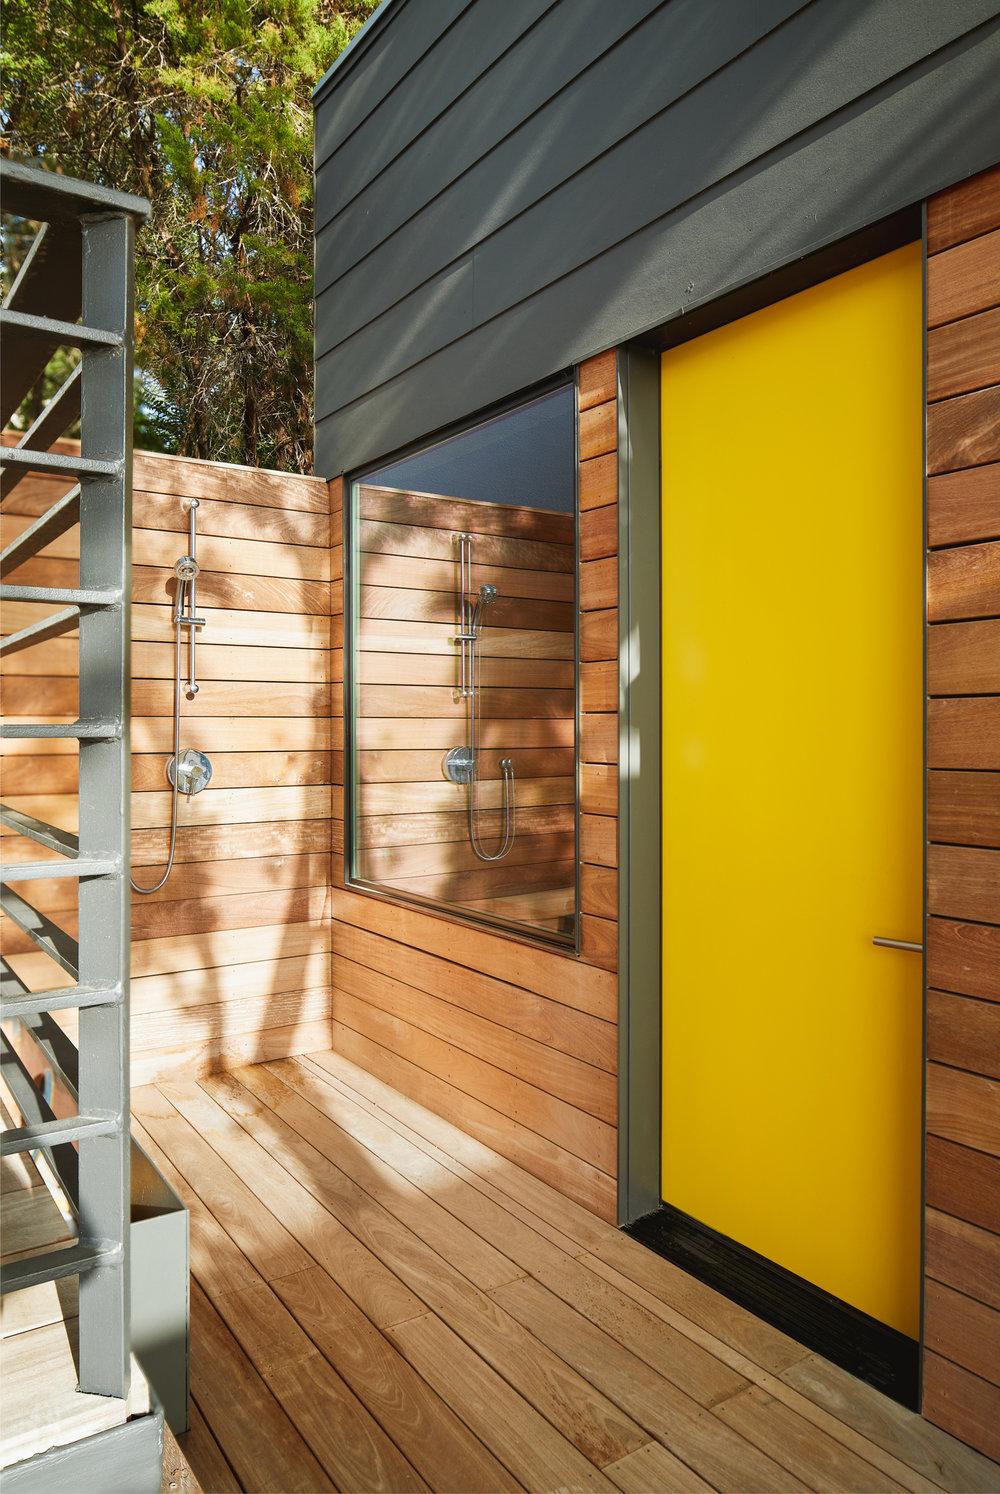 23 Via Media Residence by Matt Fajkus Architecture. Photography by Leonid_Furmansky.jpg